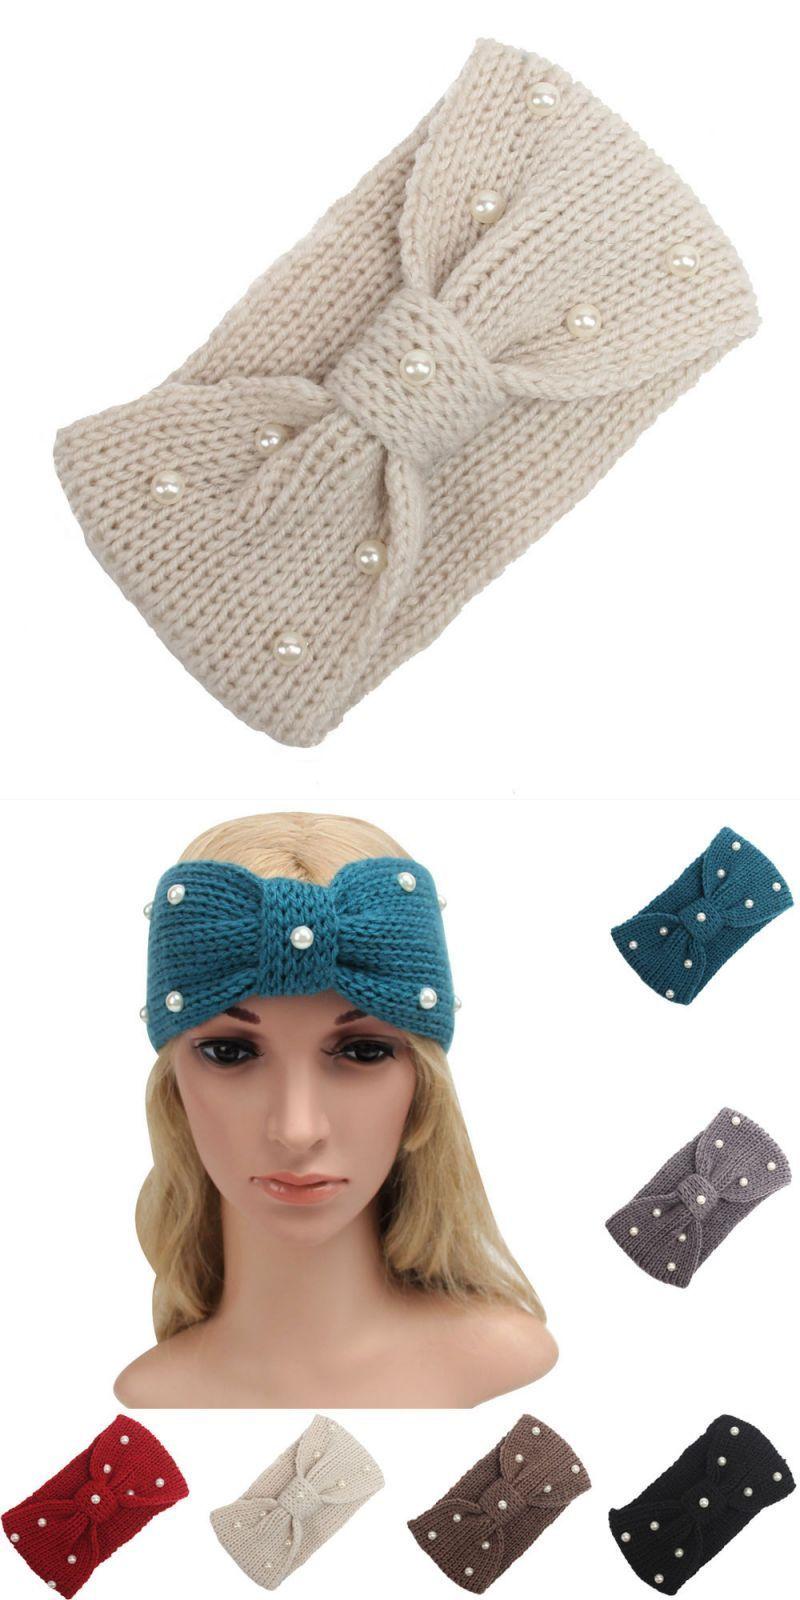 Women winter knitting headband lady hair accessories soft solid headbands  handmade girls warmer hairband  women  cotton  adult  fashion  headbands   solid   ... 5894045e2e82